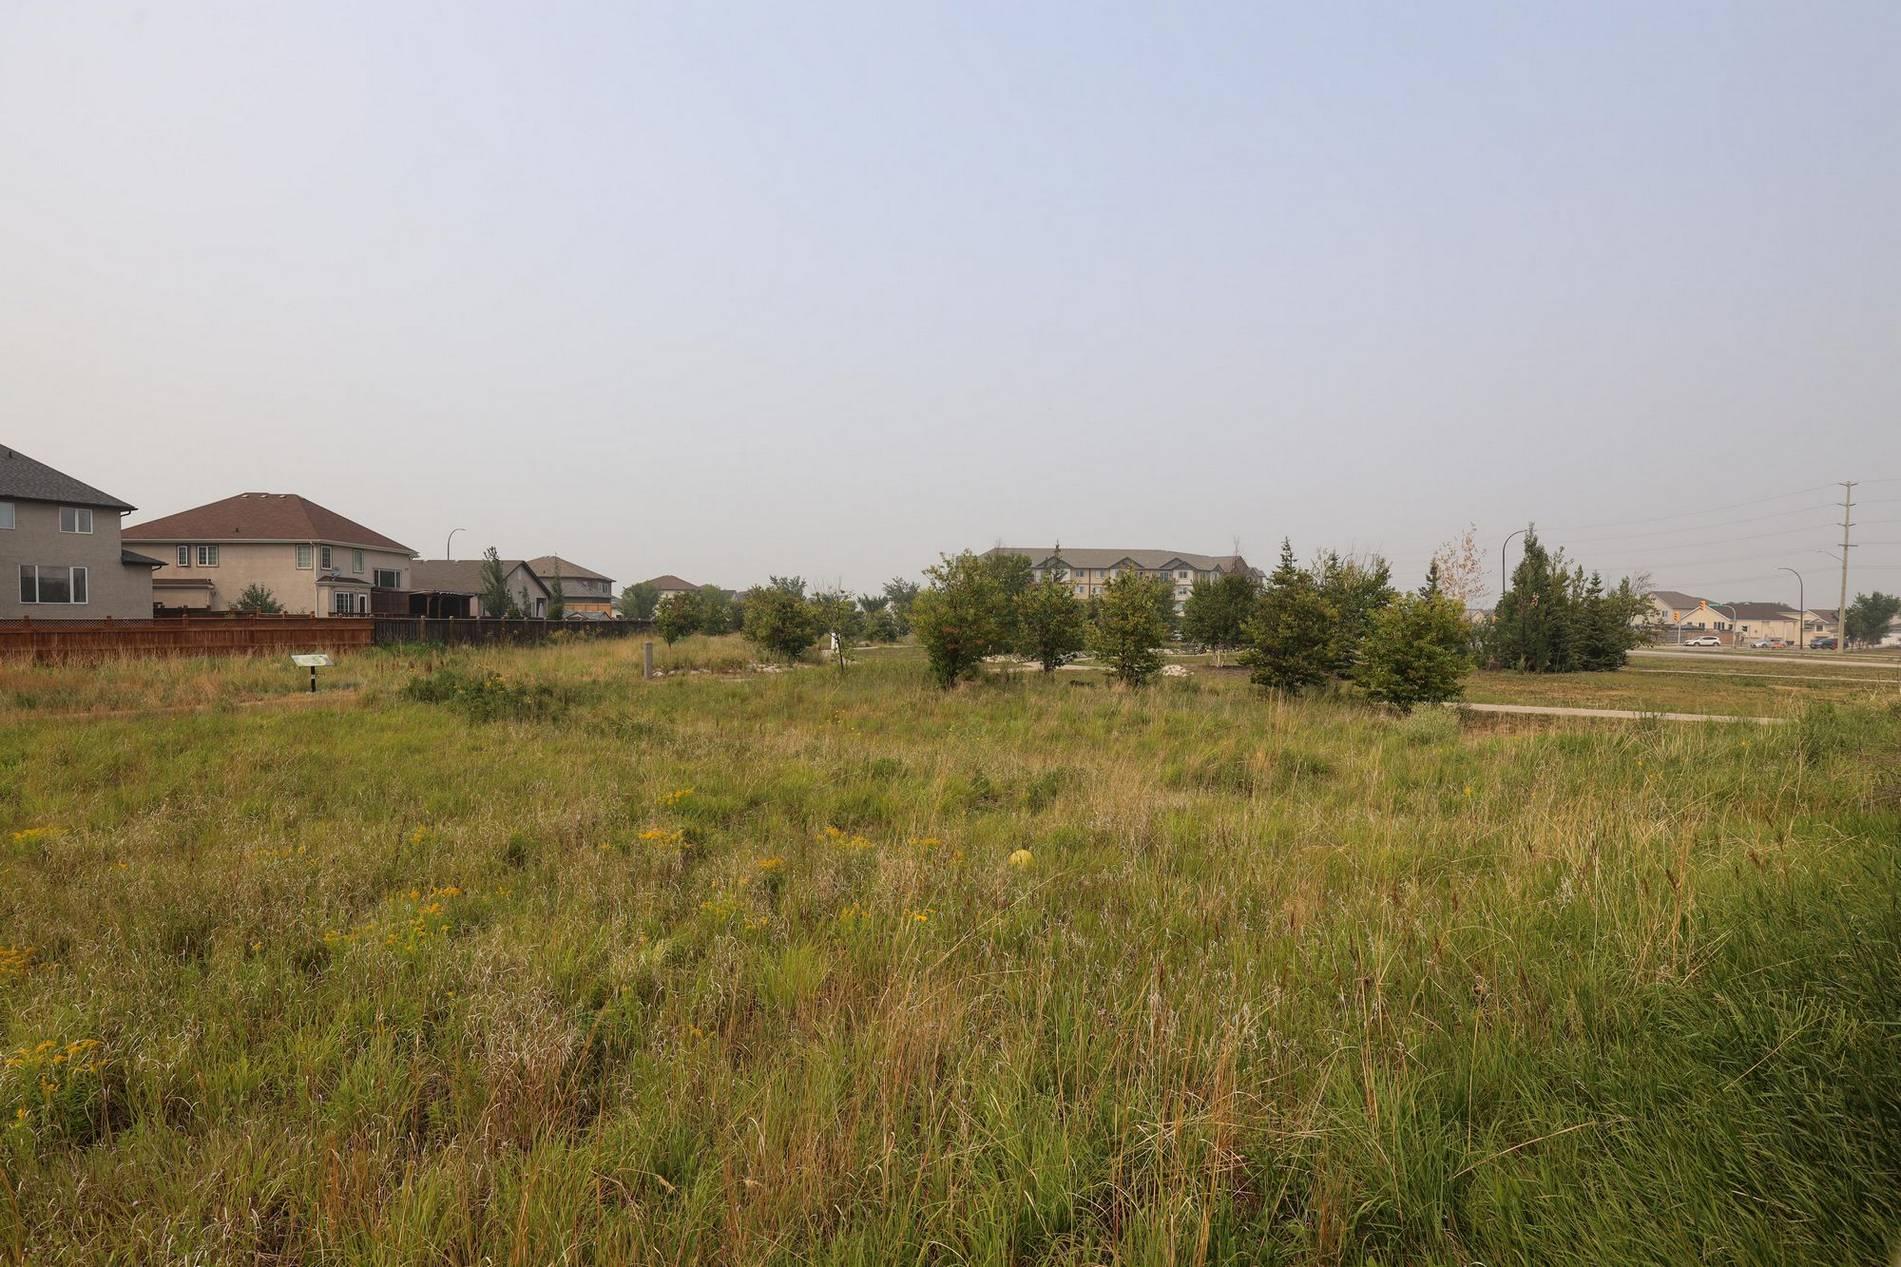 11 Autumnview Drive, Winnipeg, Manitoba  R3Y 0C6 - Photo 36 - 202118163